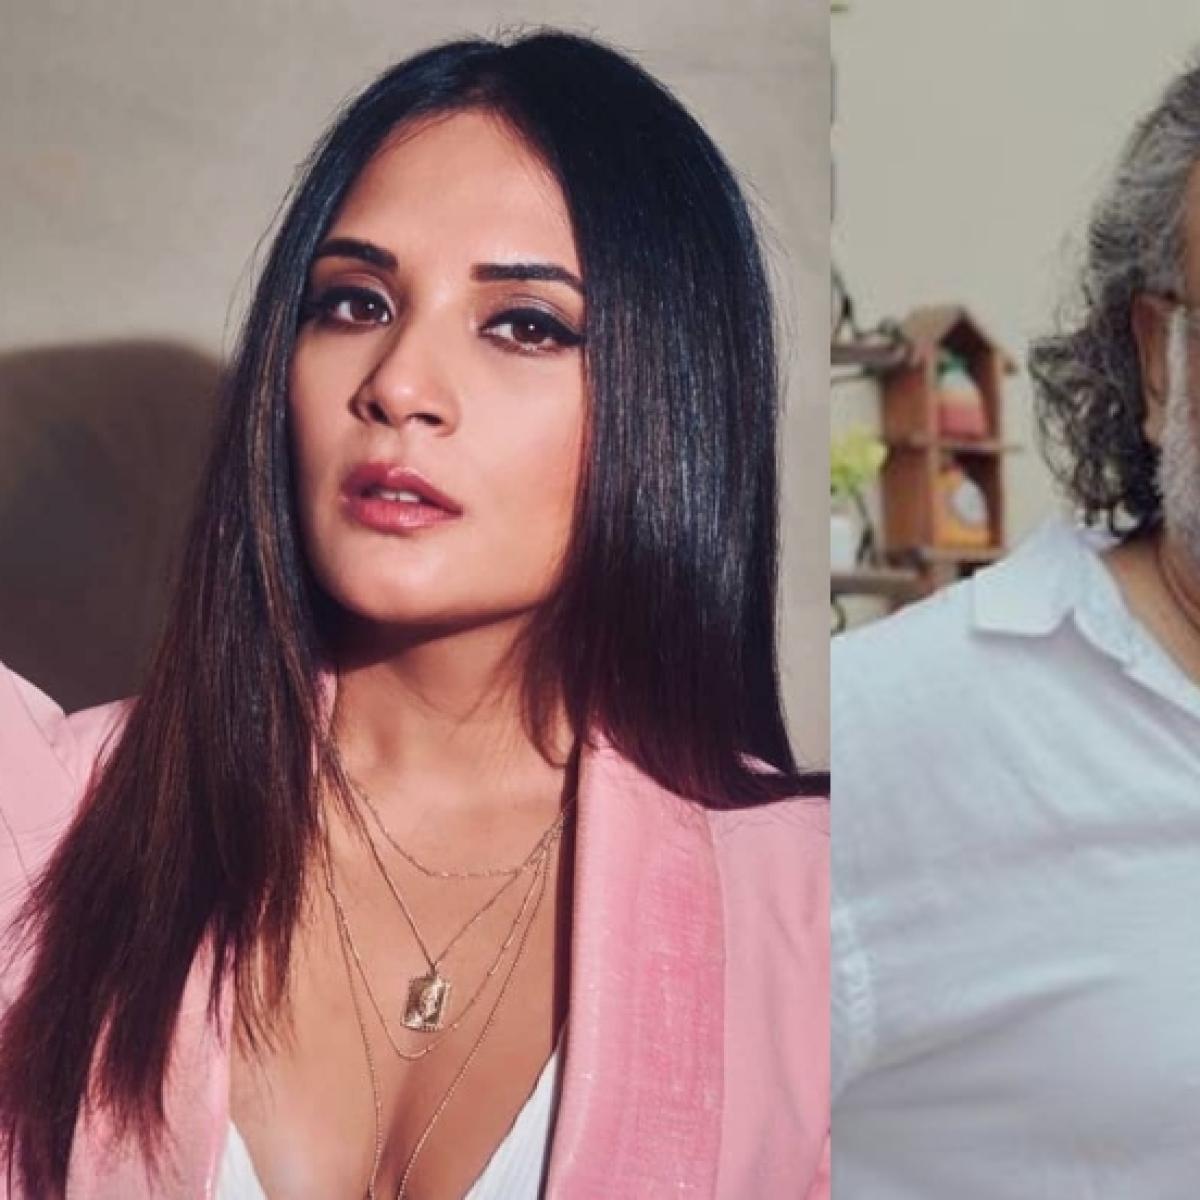 Richa Chaddha to essay sex worker in Anubhav Sinha's next